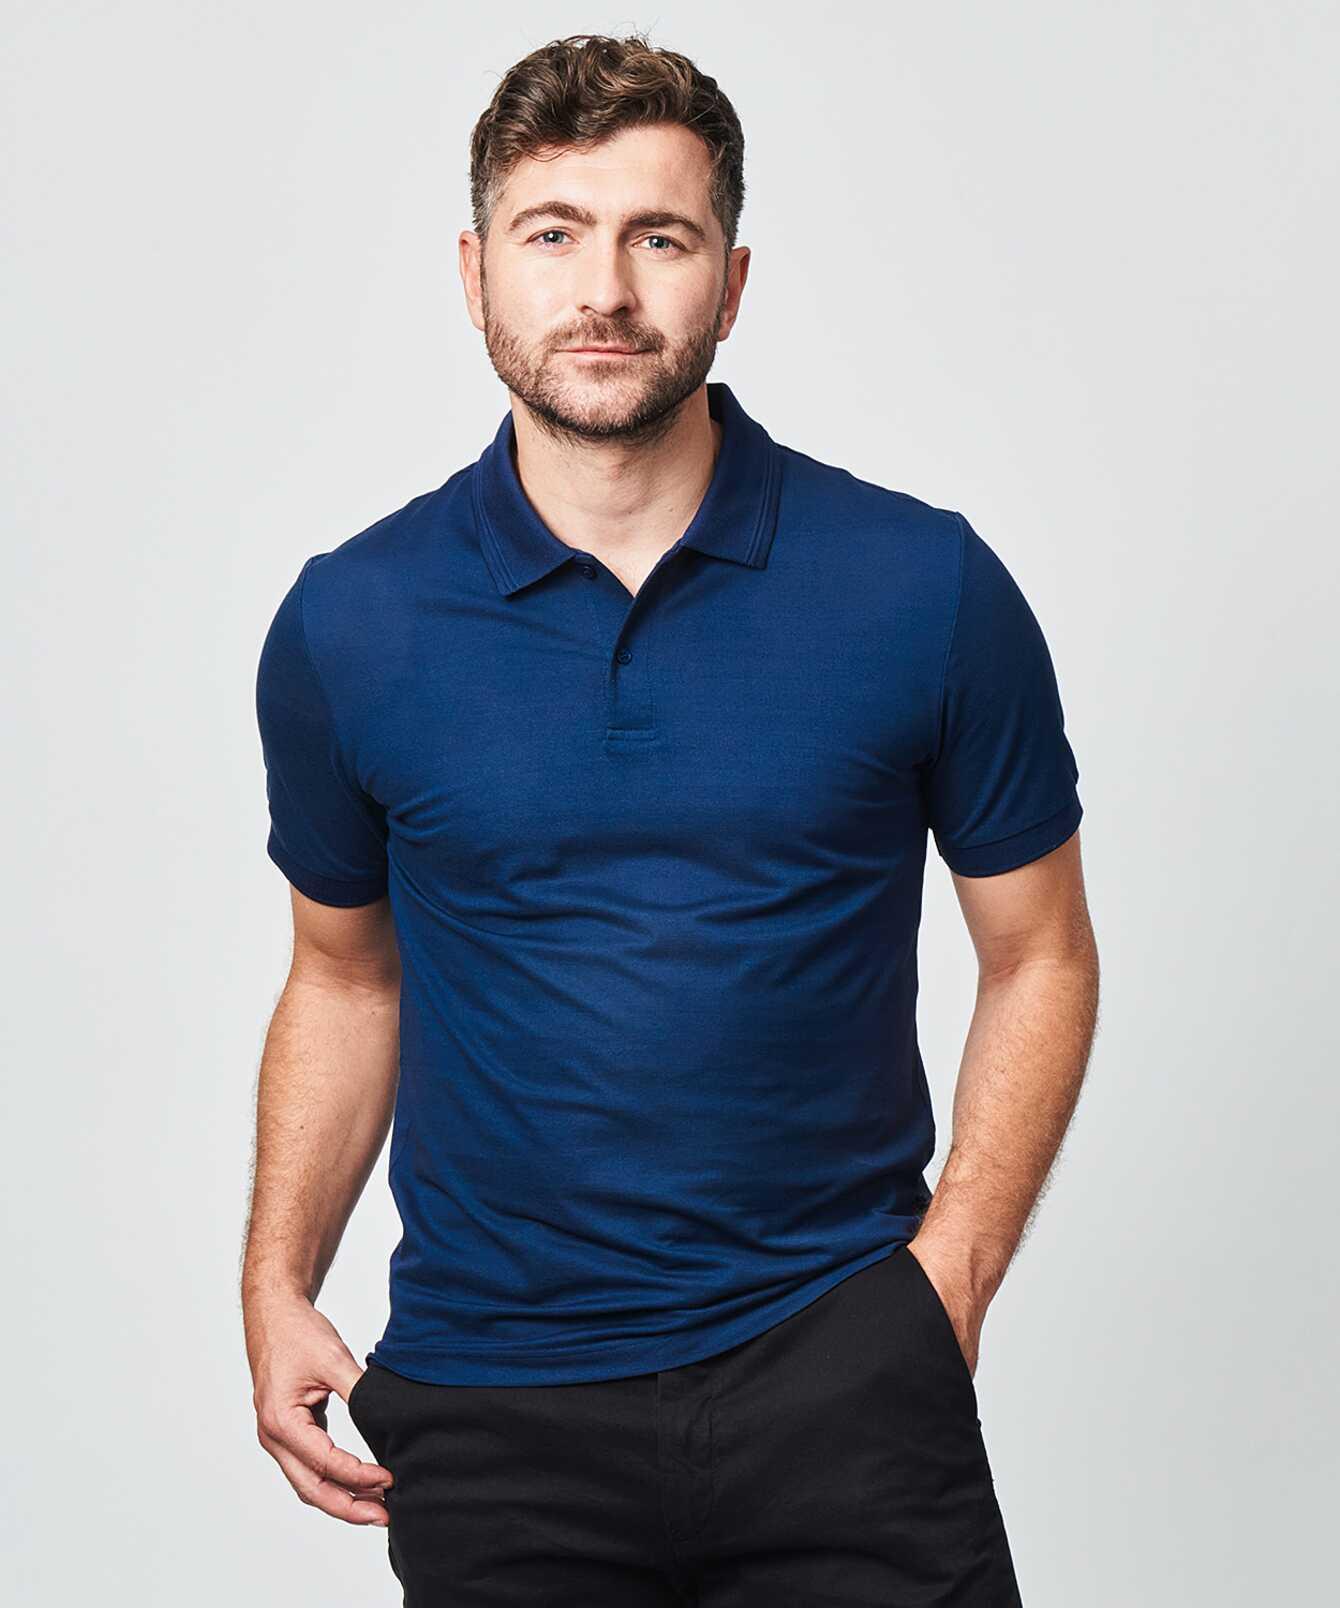 Shirt Mercerized polo shirt navy The Shirt Factory